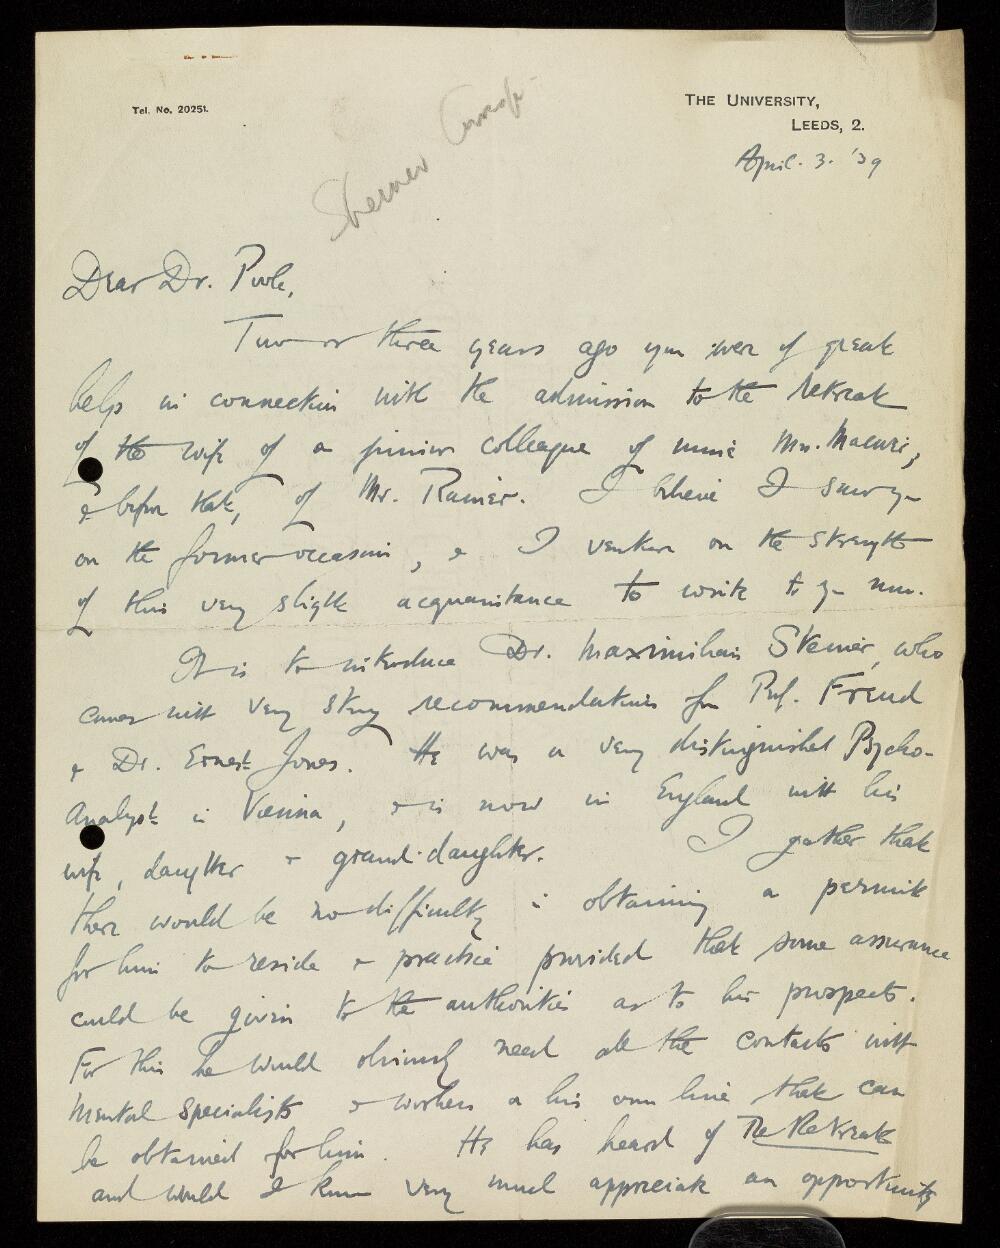 Letter from John W. Harvey, University of Leeds to Dr. Arthur Pool concerning Dr. Maxim Steiner, April 1939.